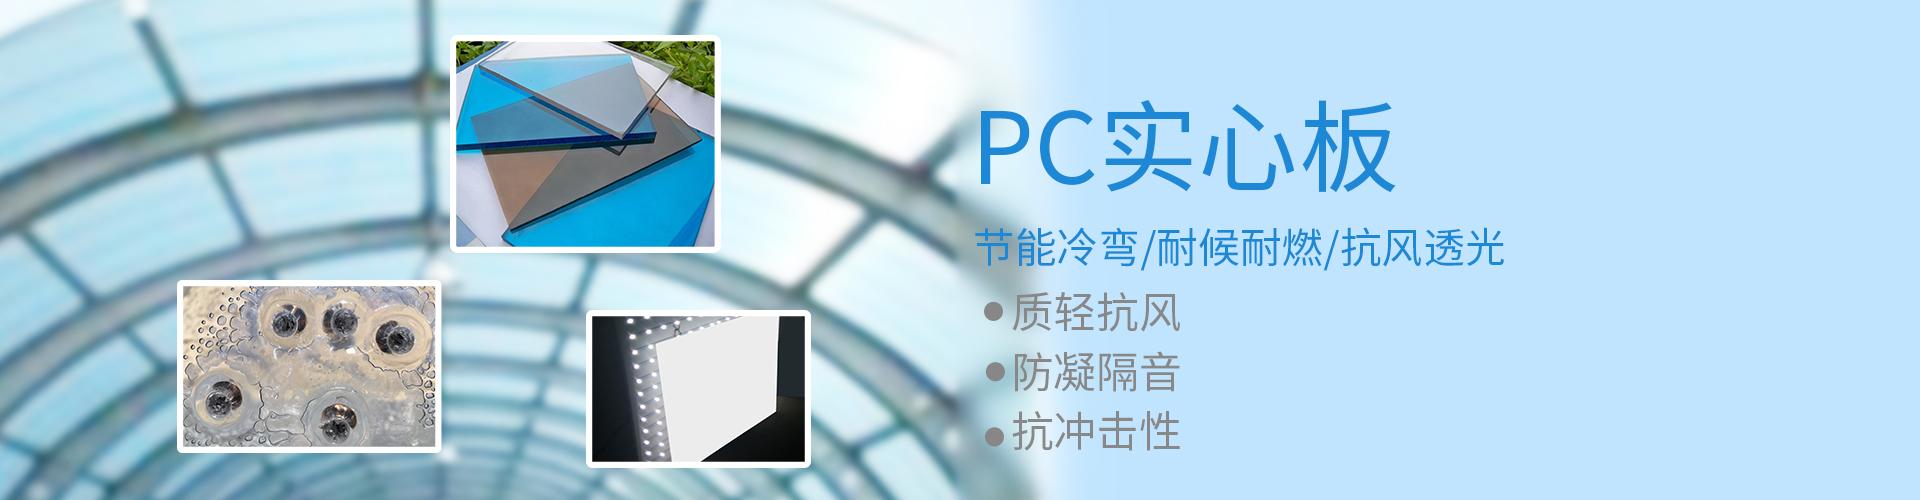 PC阳光板一般都具有哪些特性